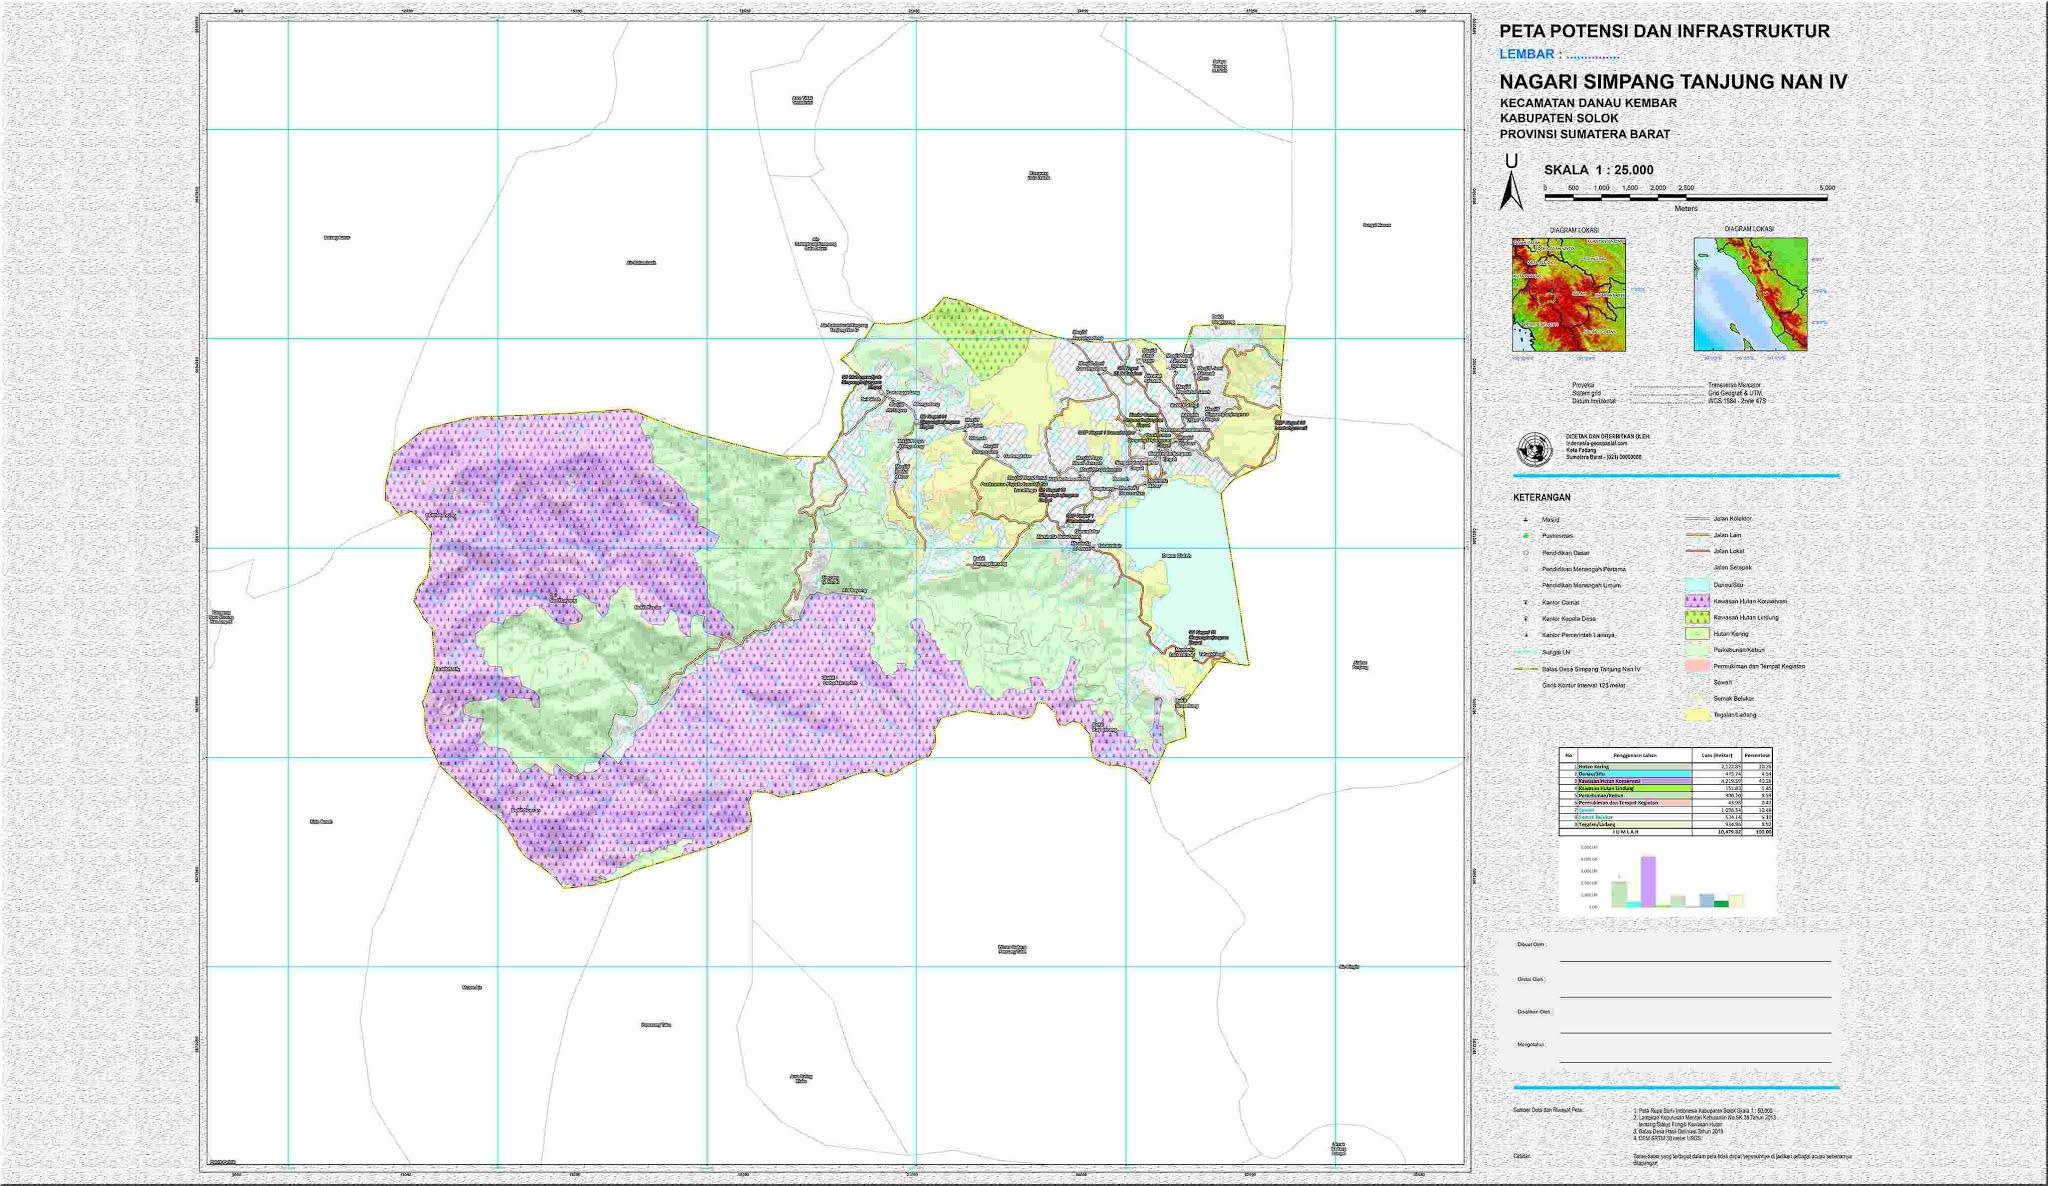 Teknis Pembuatan Peta Desa, Lengkap Bahan-bahannya